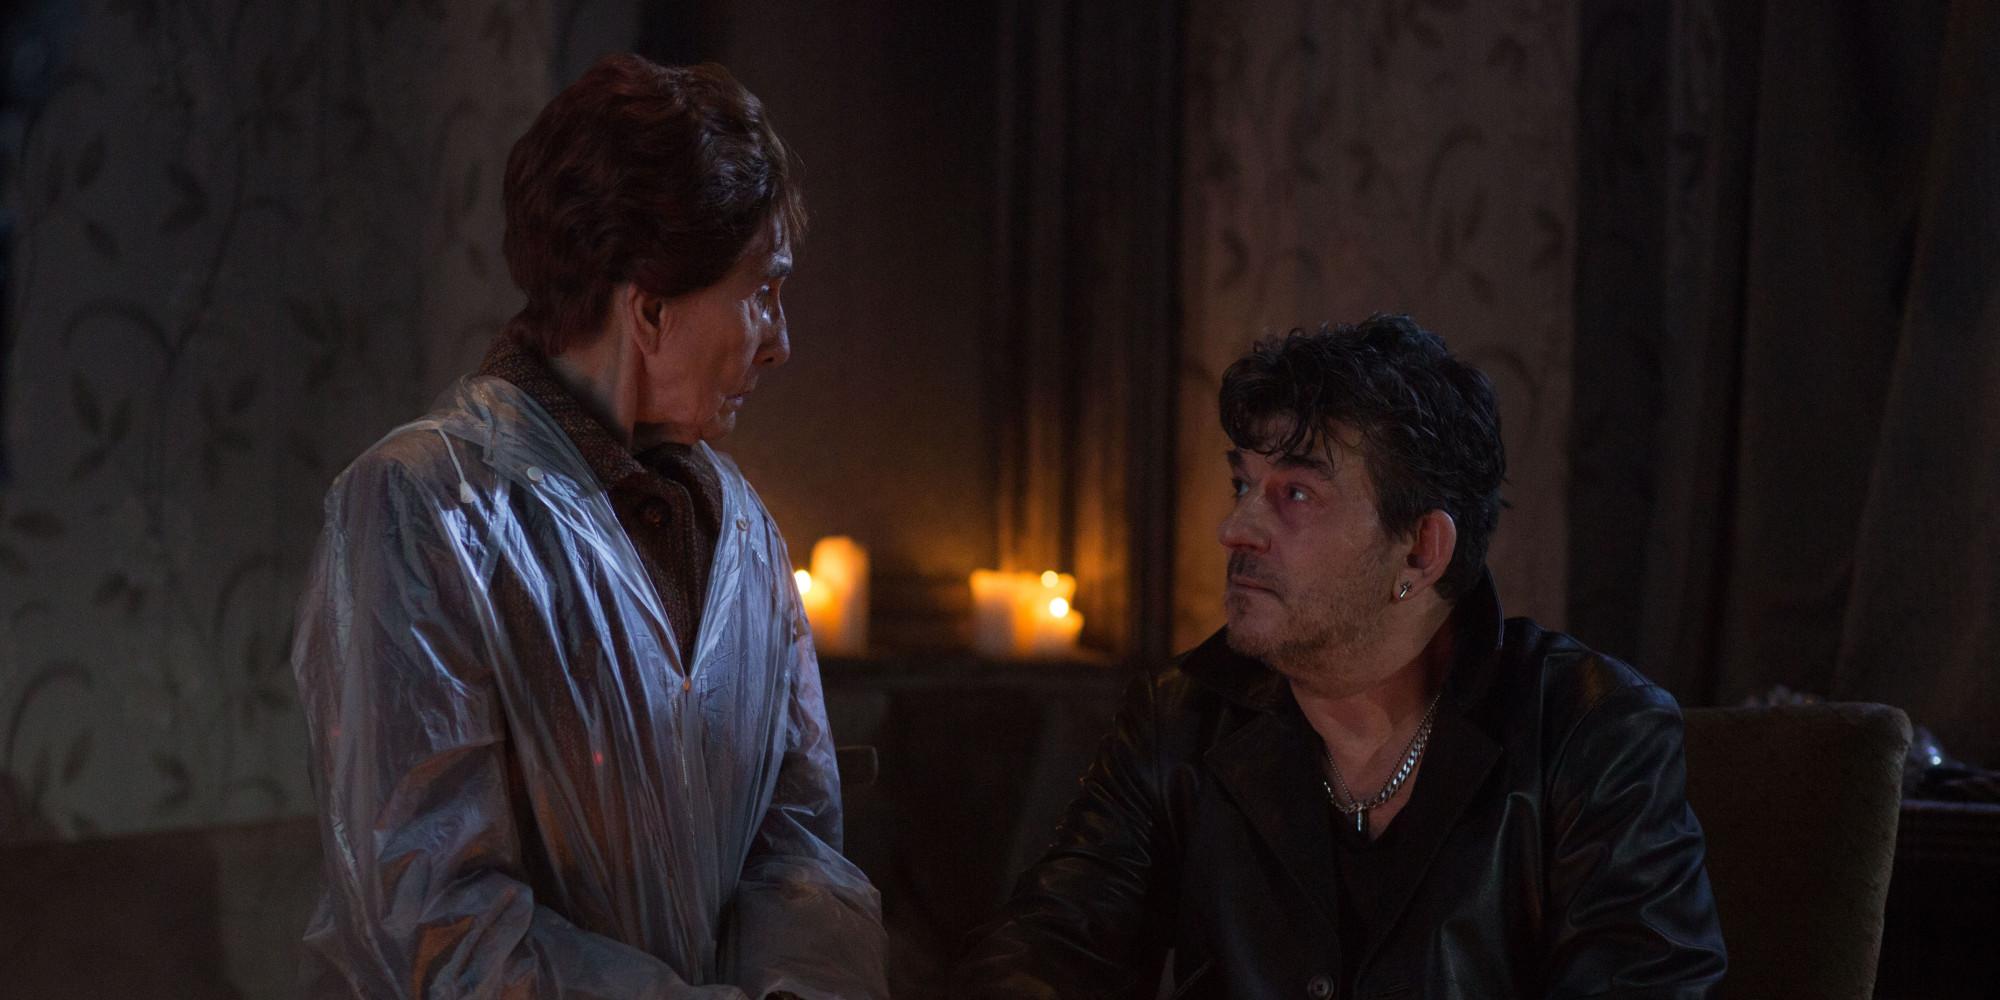 'EastEnders' Spoiler: Nasty Nick Is (Finally!) Dead - But ...